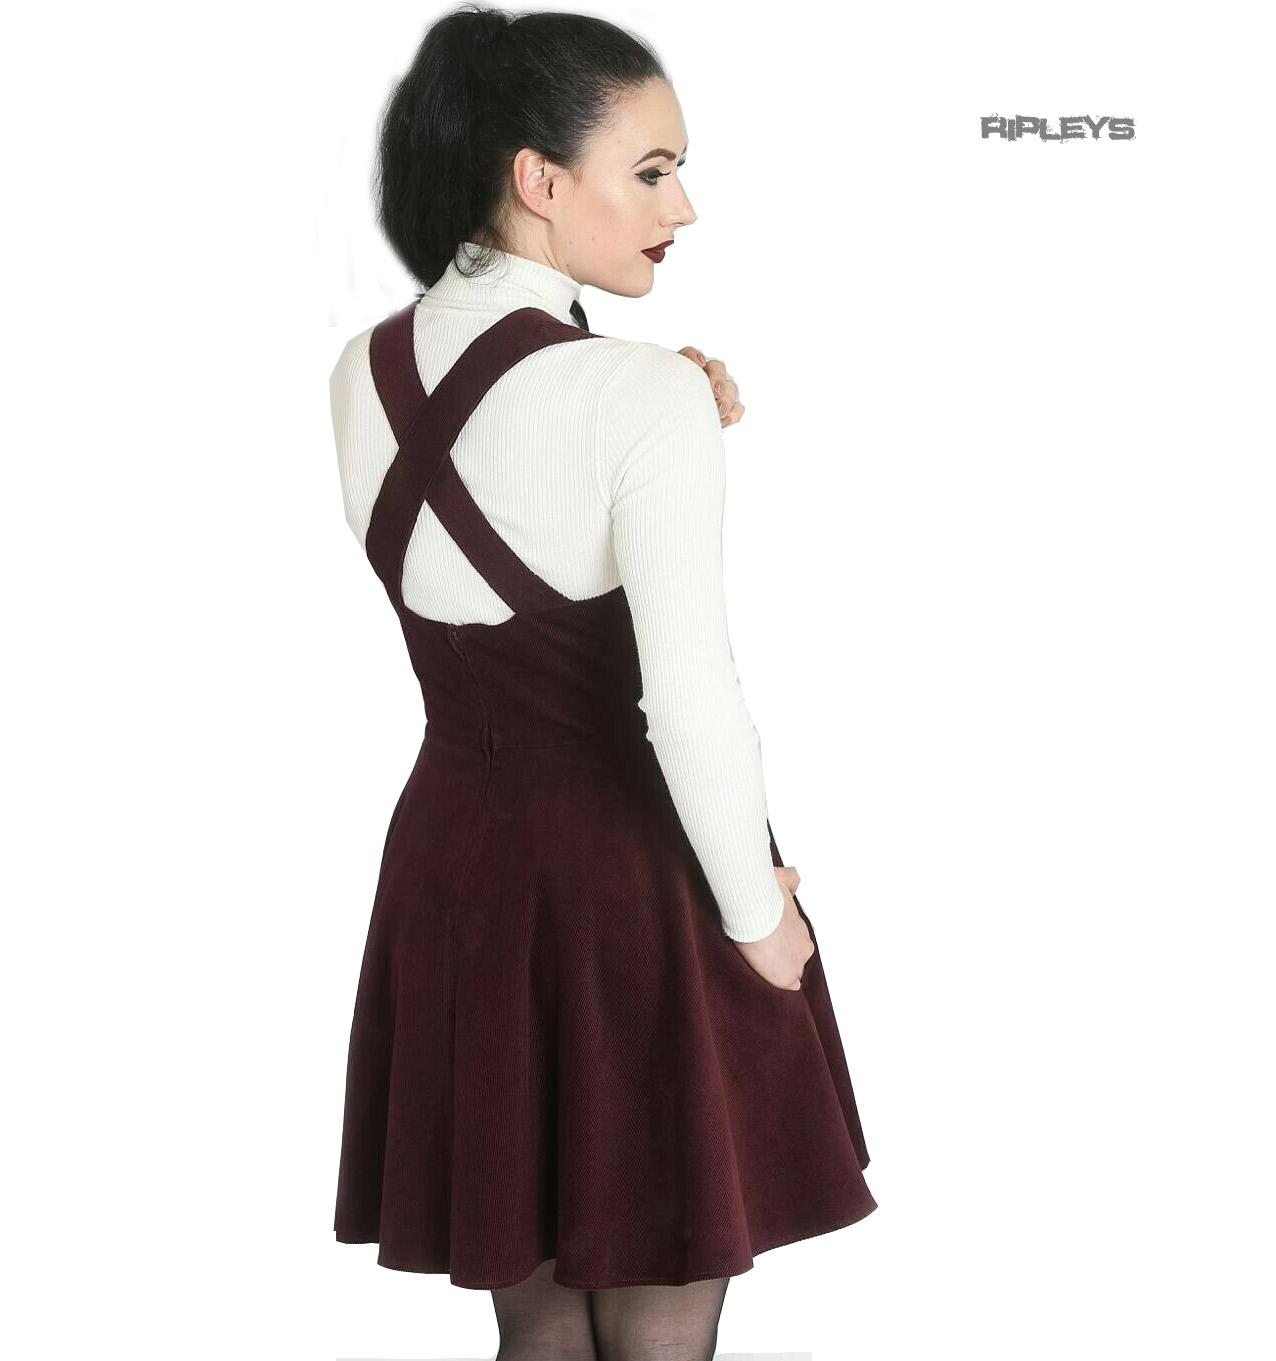 Hell-Bunny-Rockabilly-Corduroy-Mini-Dress-WONDER-YEARS-Pinafore-Wine-All-Sizes thumbnail 8